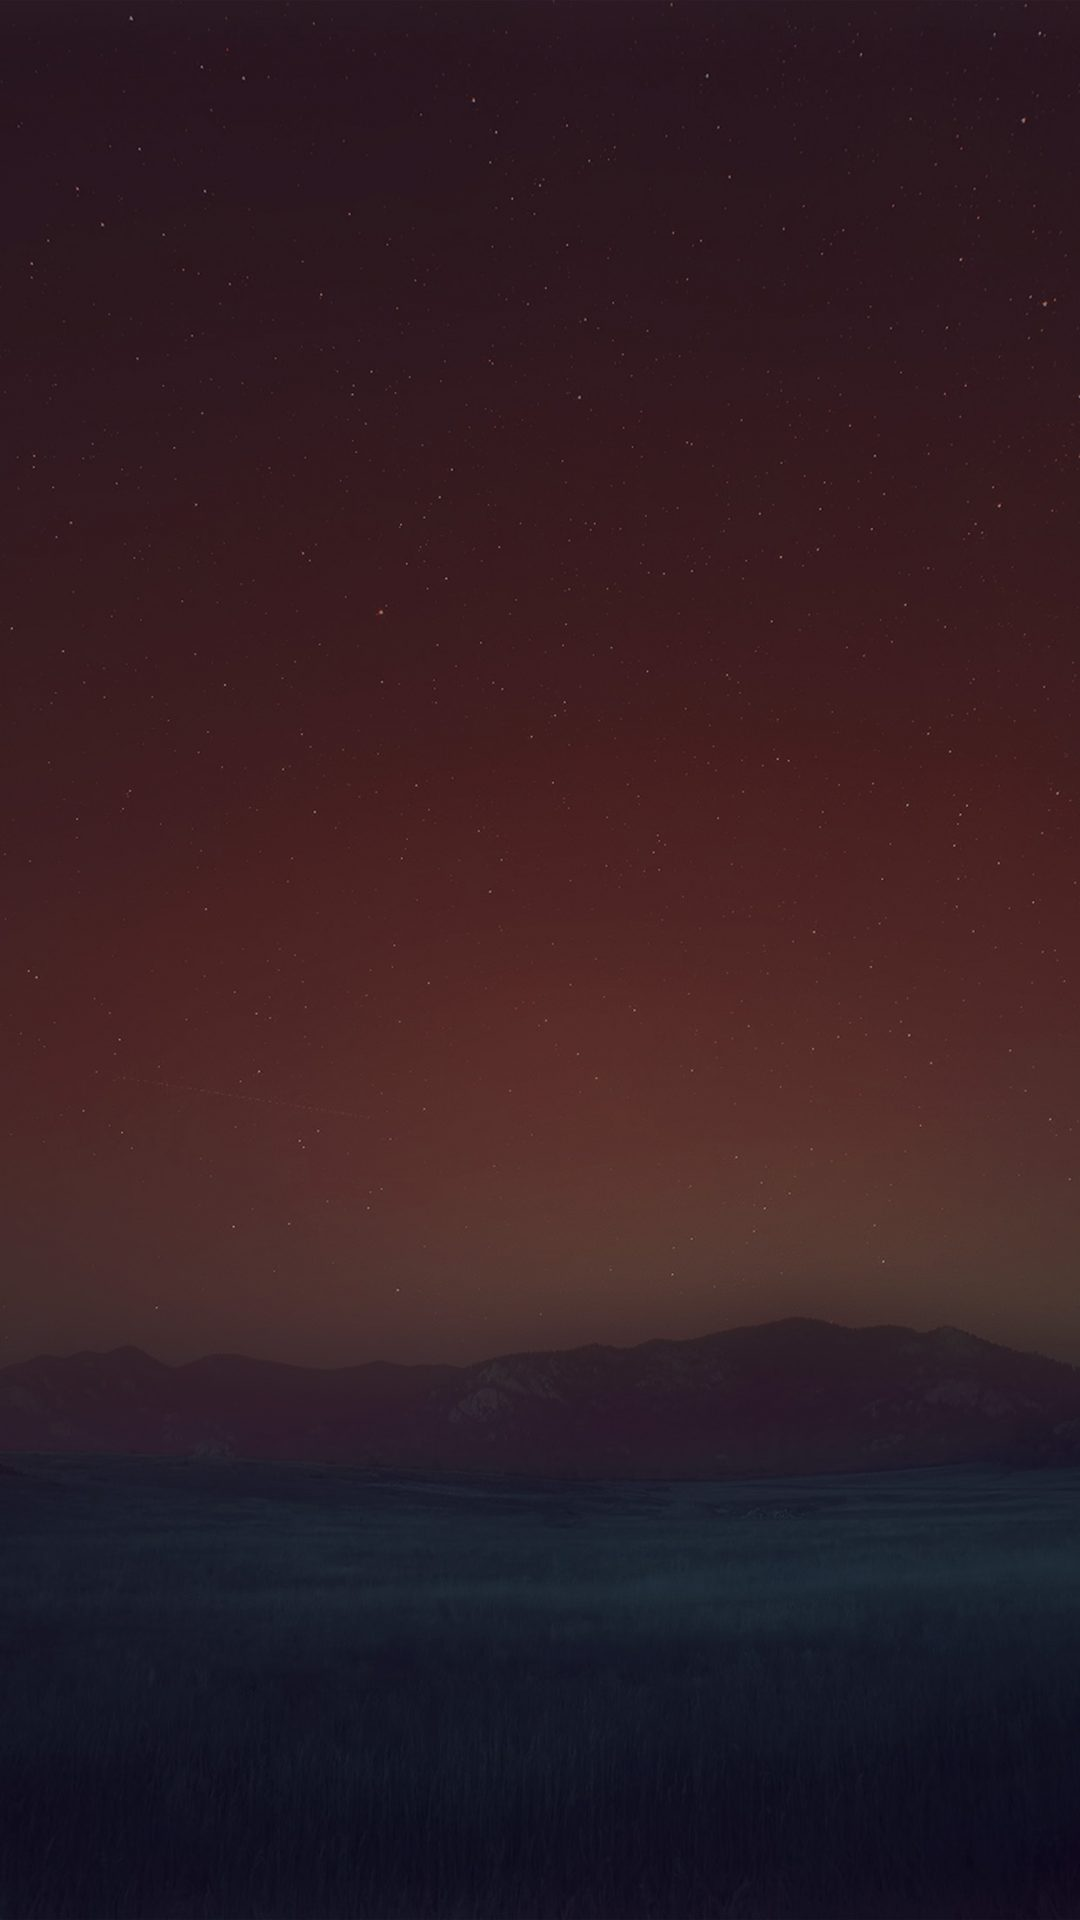 Night Sky Star Shine Nature Fall Blur